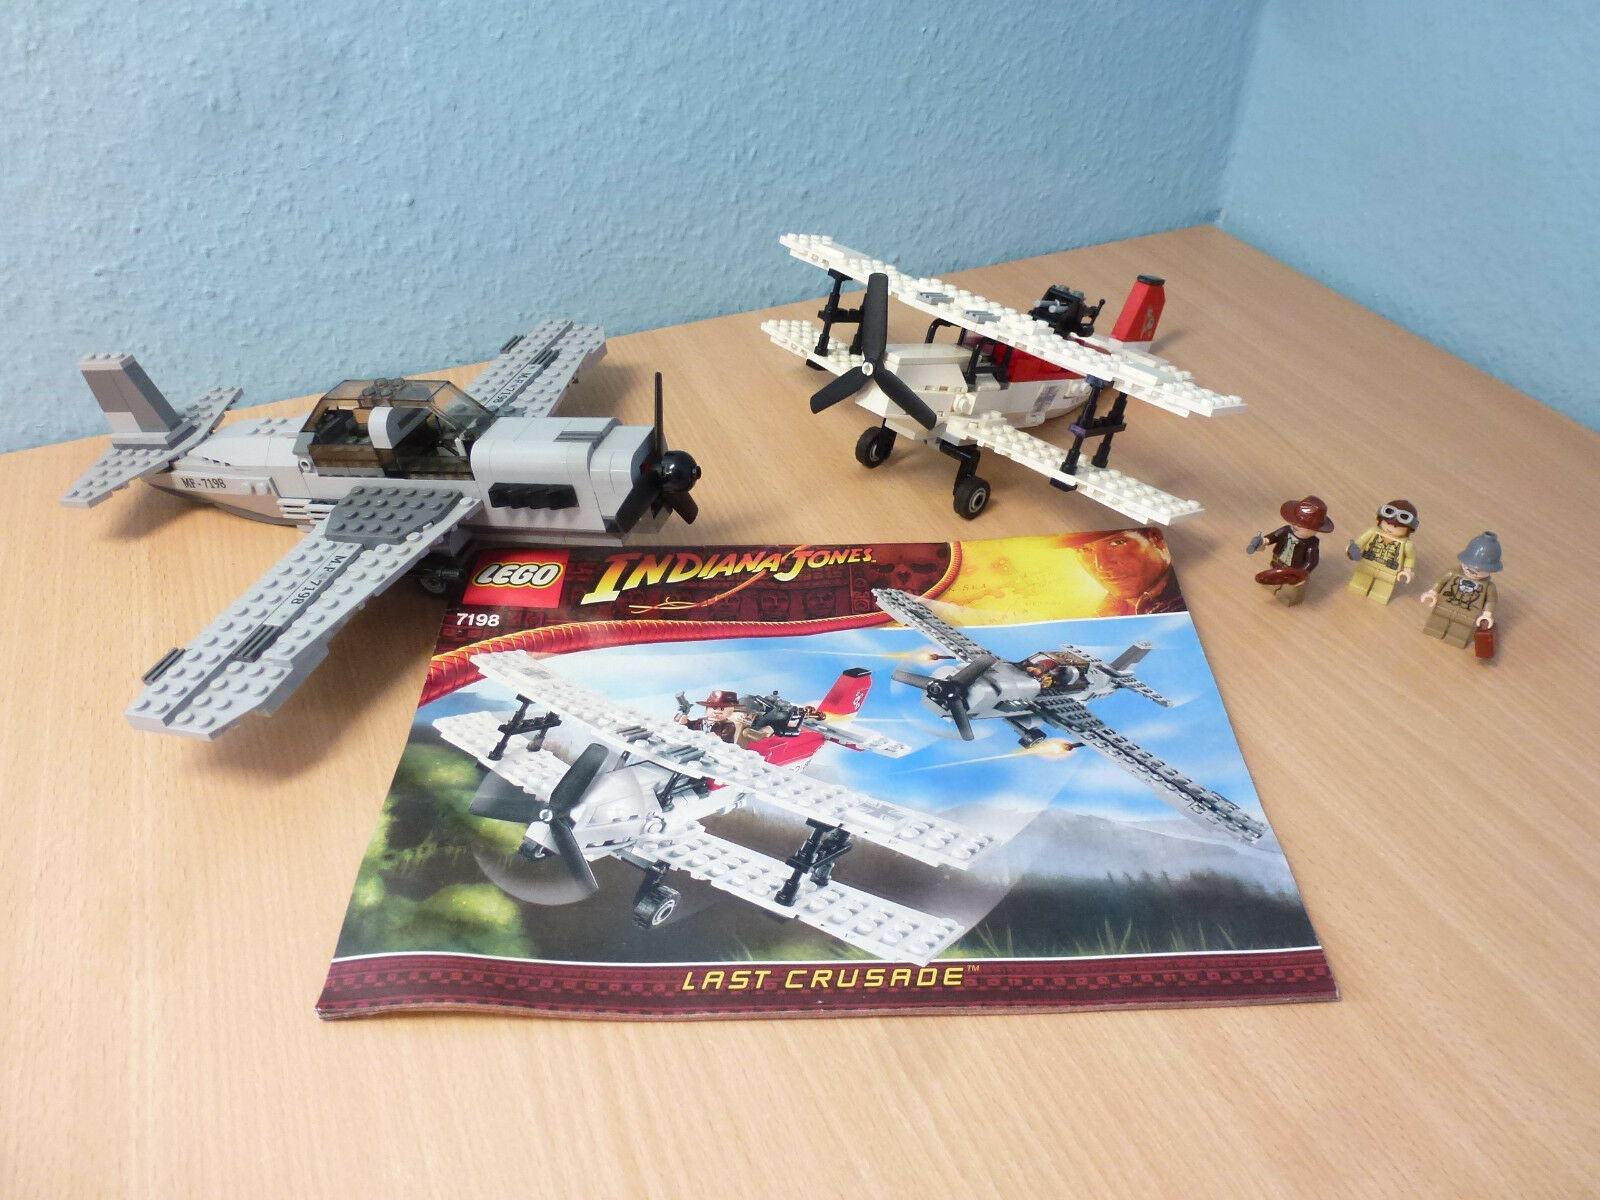 Lego 7198 Indiana Jones Set - Flucht im Flugzeug + Bauanleitung 544